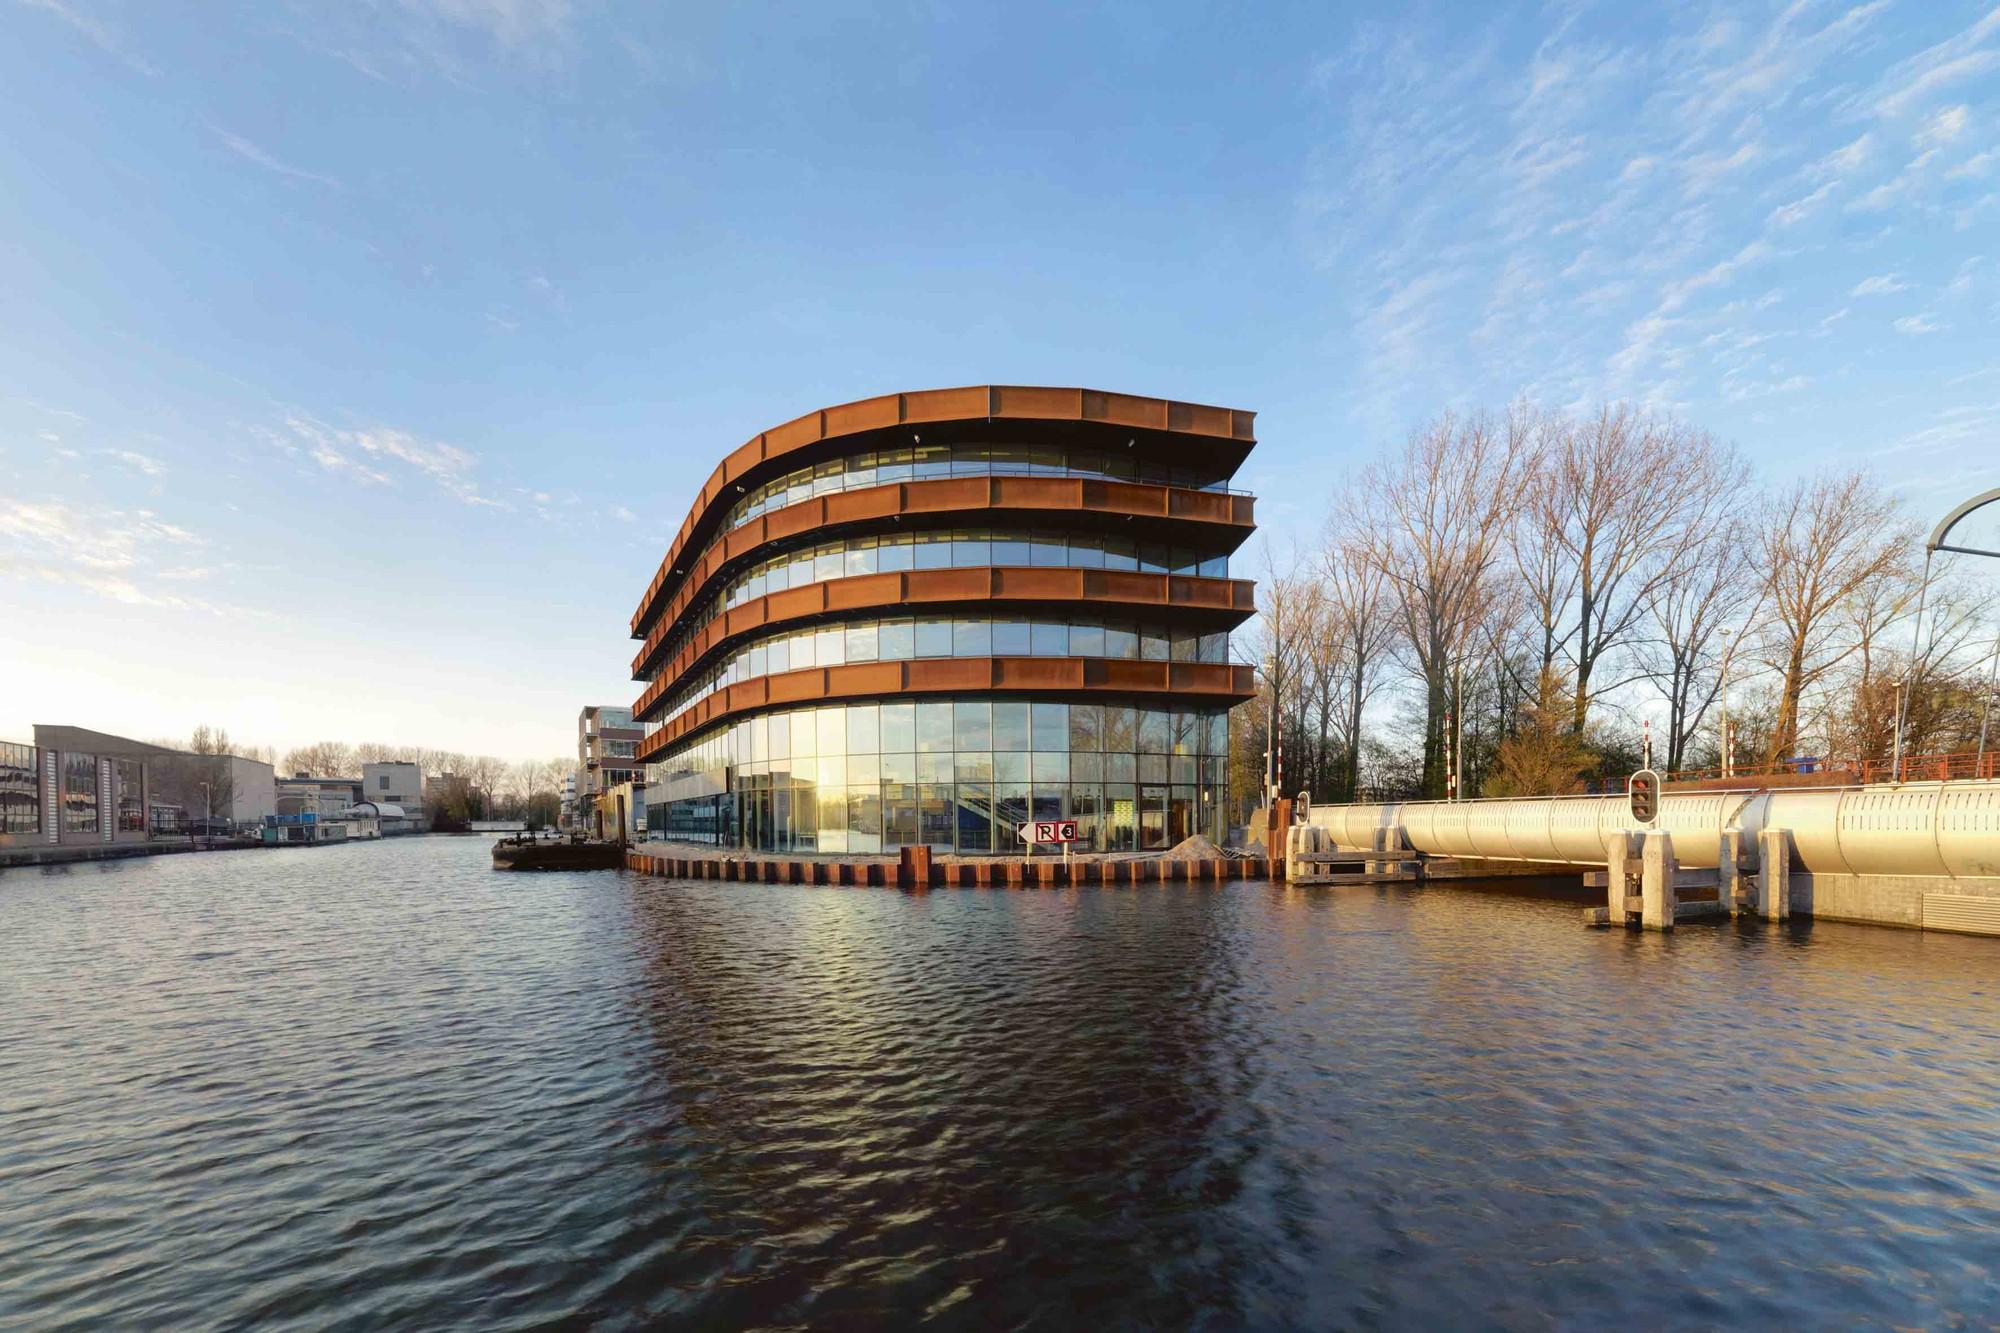 Tbwa Office Building / ZZDP Architecten, © Michel Kievits